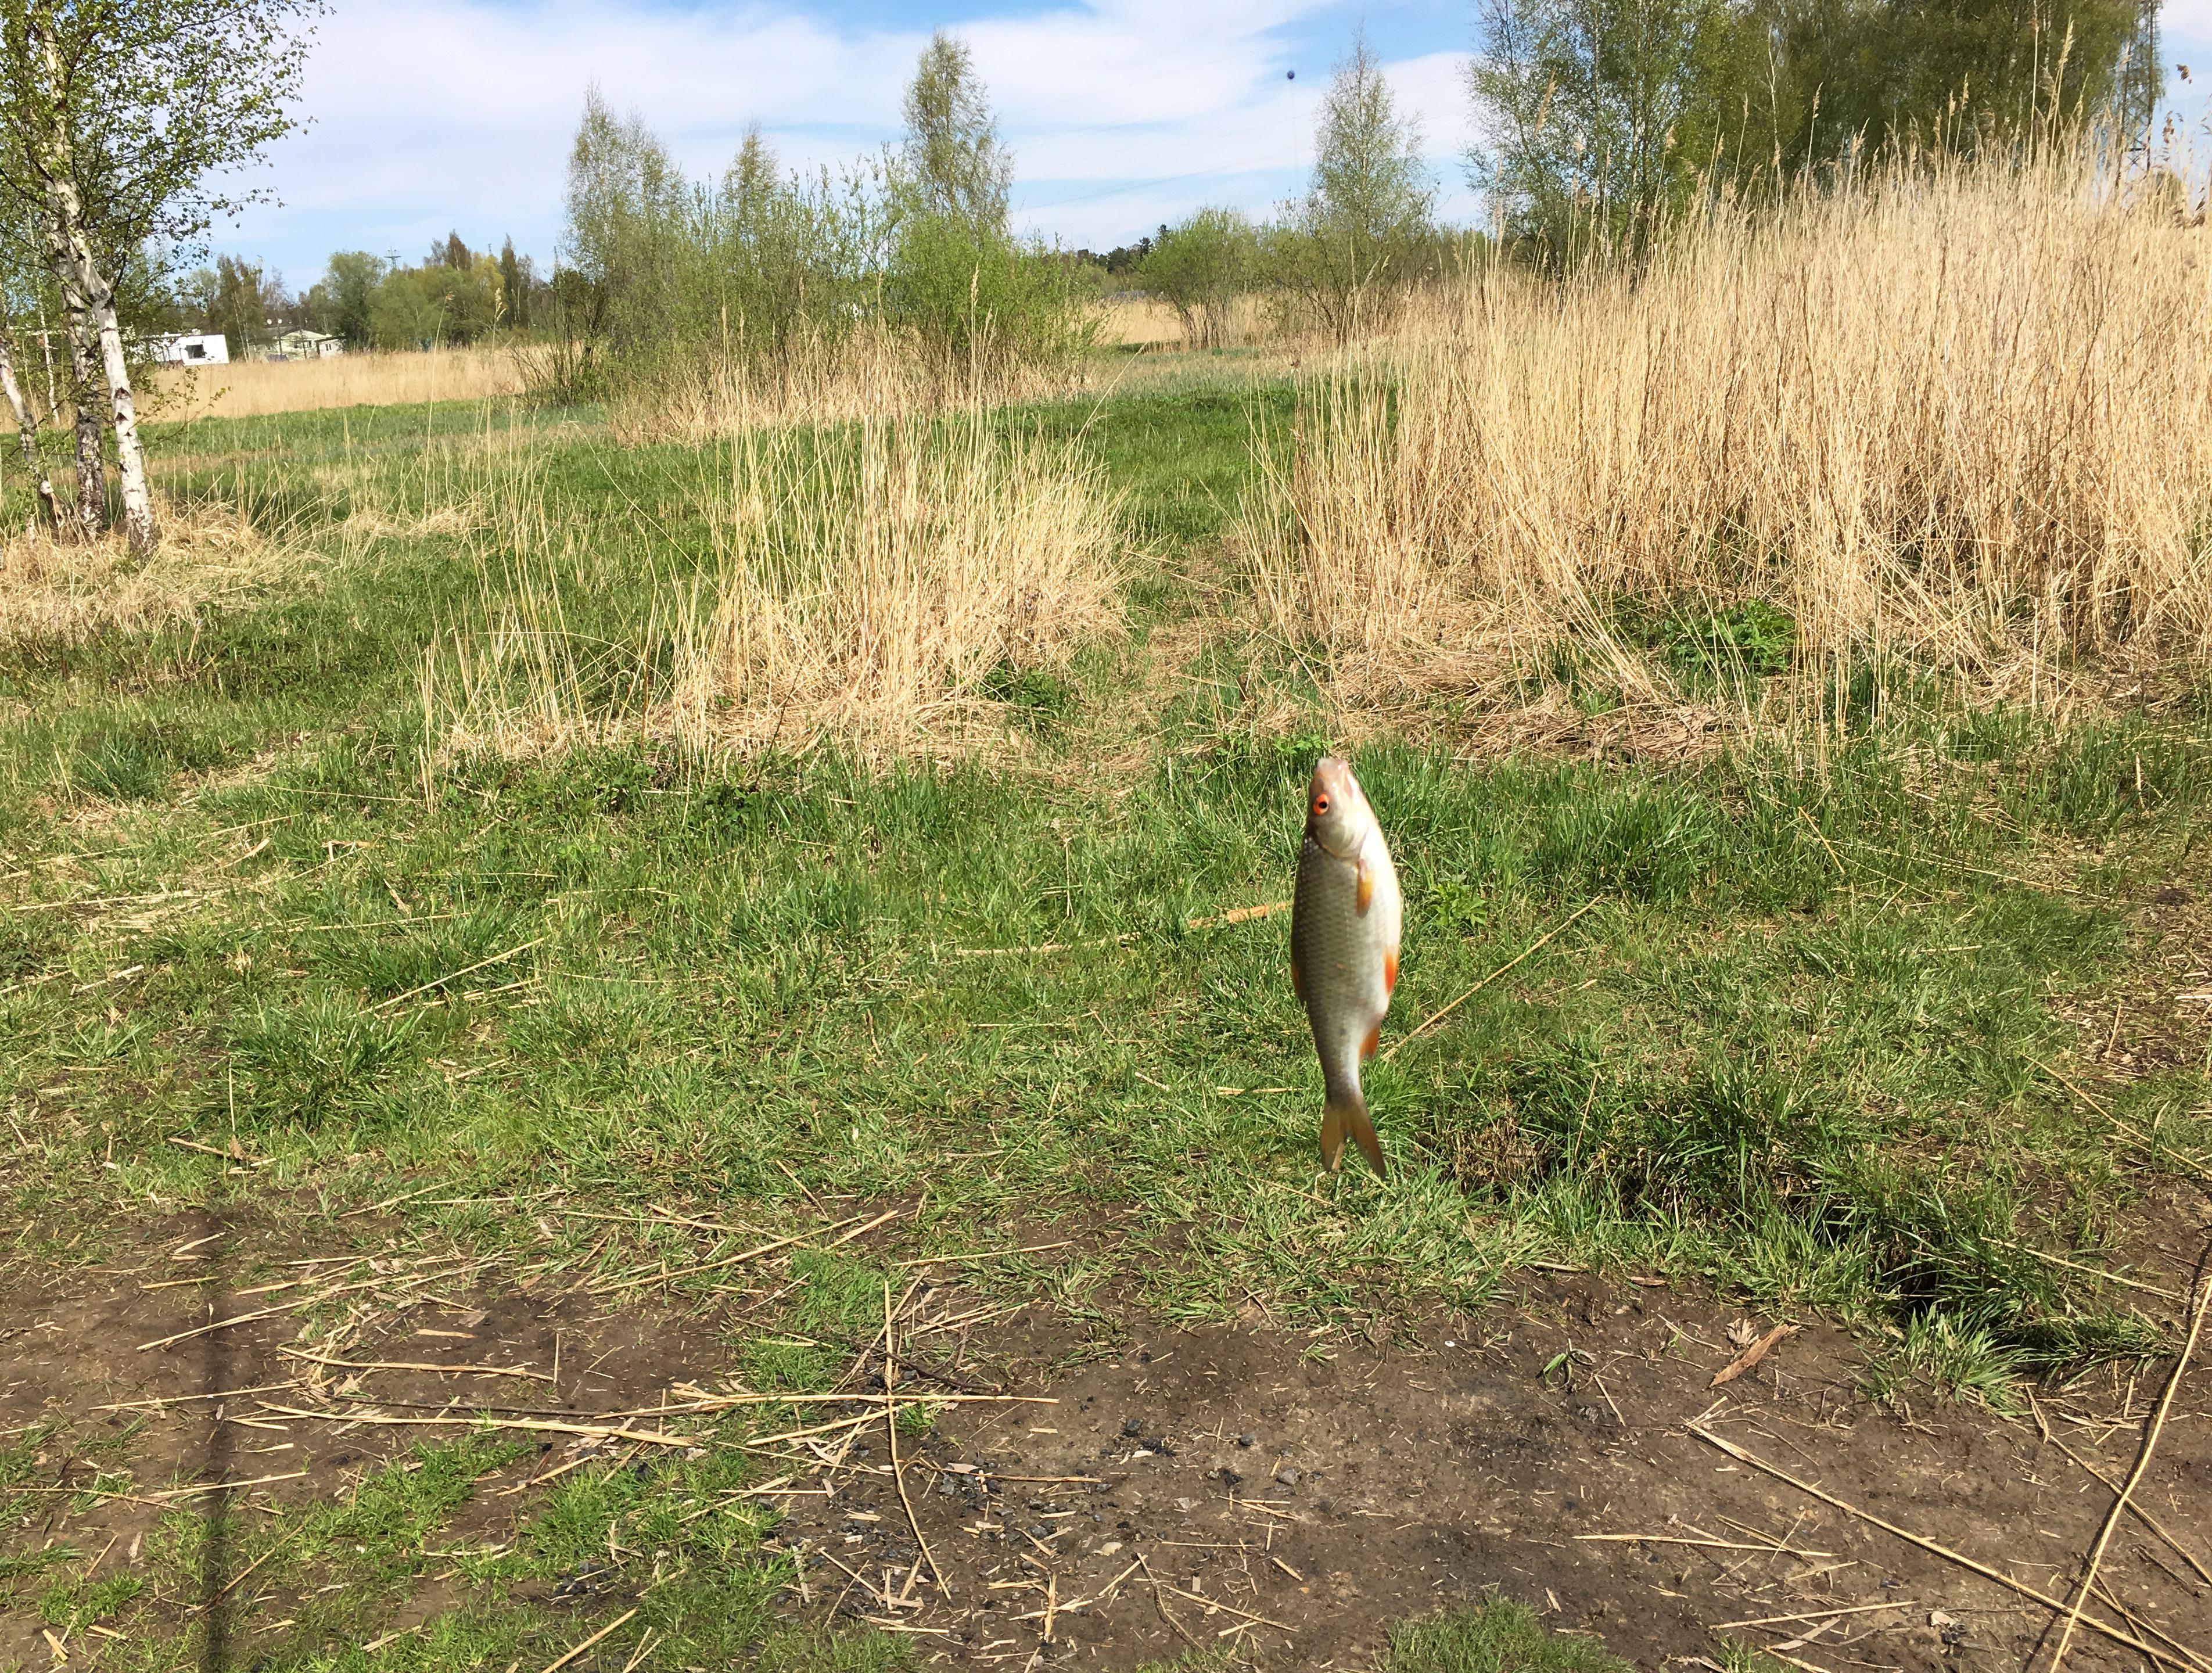 рыбалка Юрмала Латвия Лиелупе пейзажи природы плотва Альберт Сафиуллин Albert Safiullin